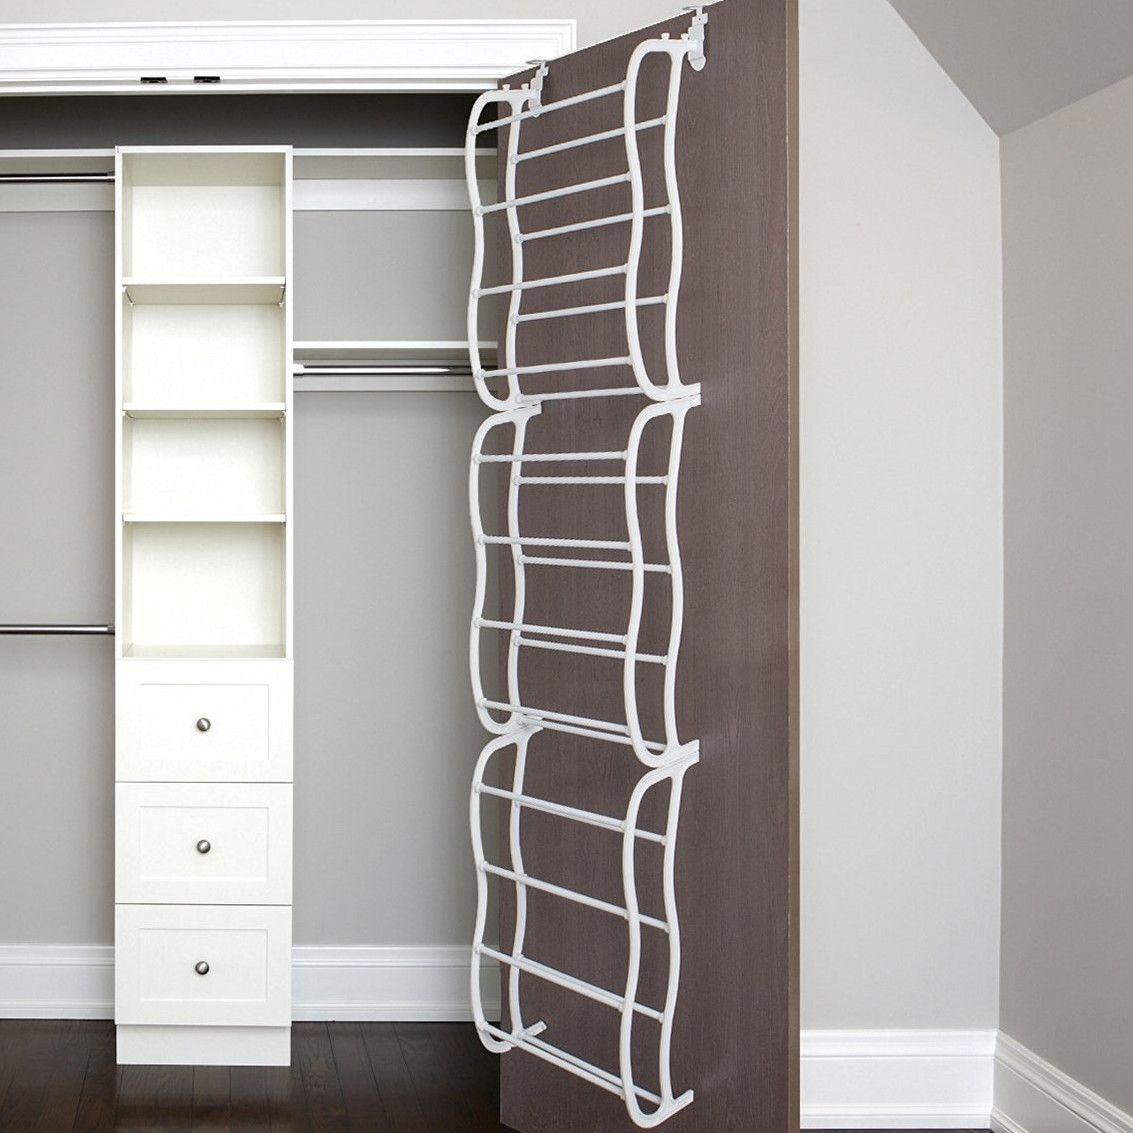 Shoe Rack w// Hooks Over the Door 12 Pair Wall Hanging Closet Organizer Storage